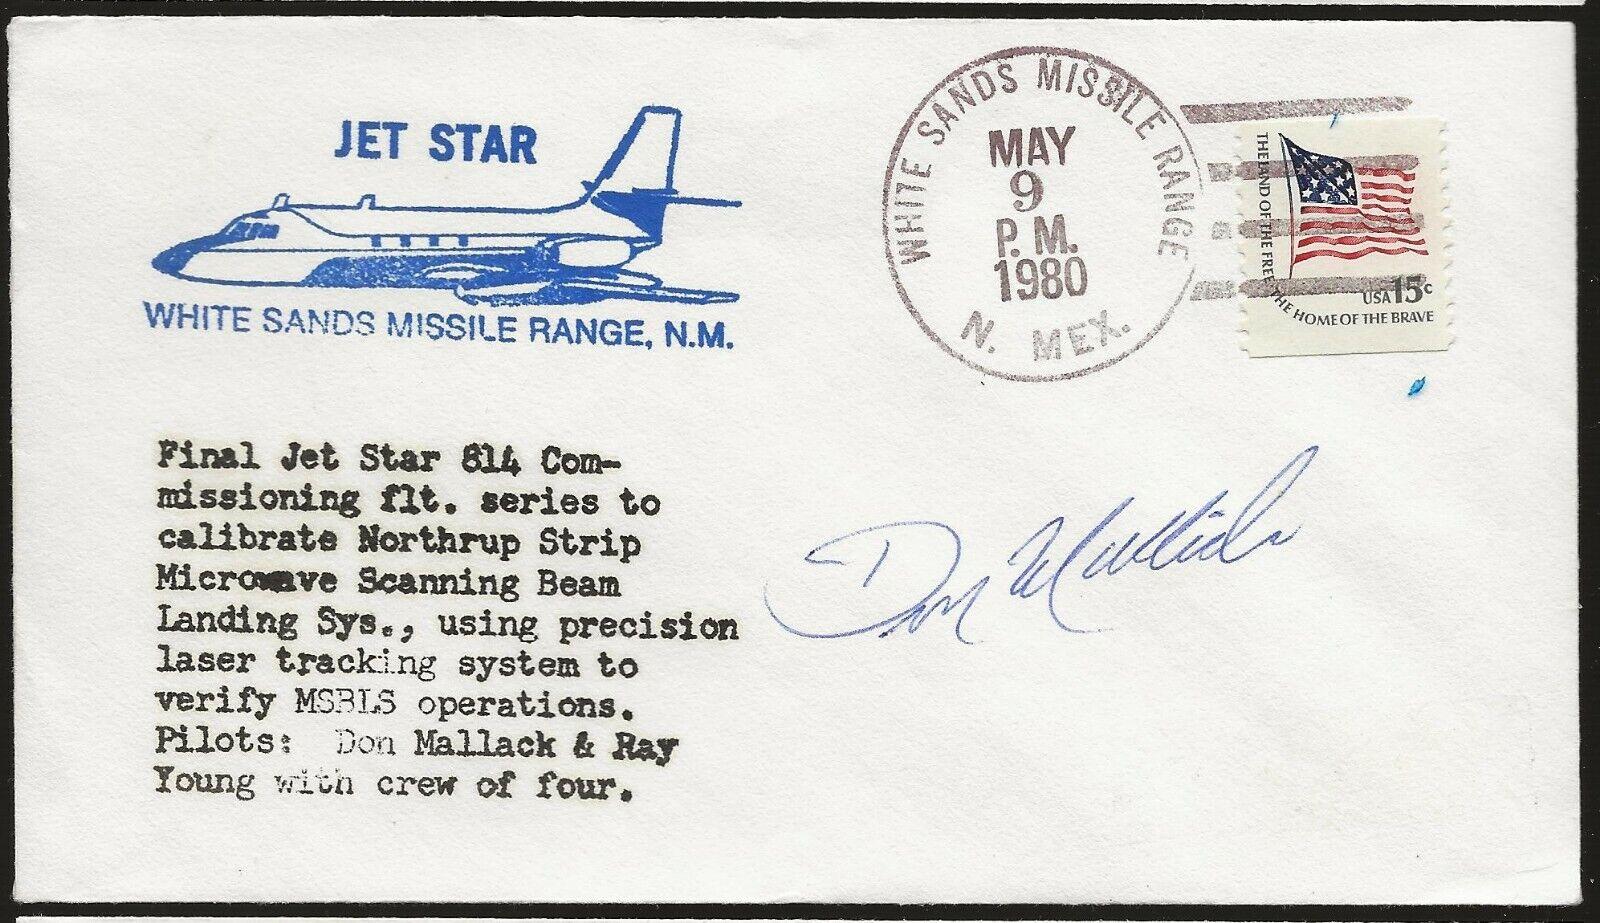 s l1600 - 1980 Jetstar Shuttle Test Flights Autographed by Astronaut Don Mallick